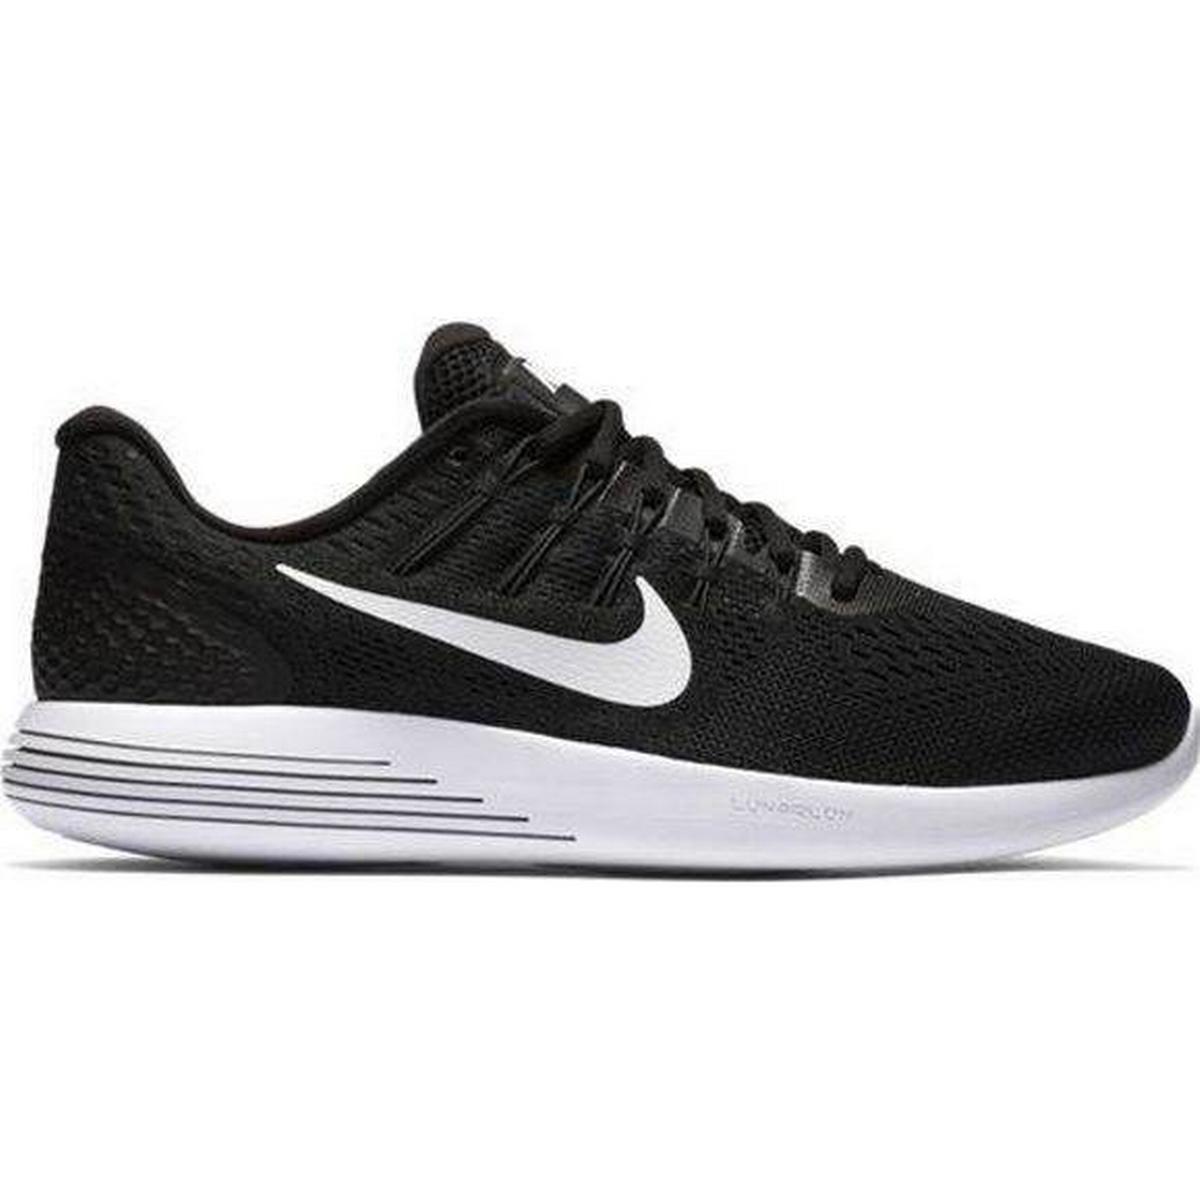 Det bästa Dam Nike Wmns Nike Lunarglide 8 BlackWhite